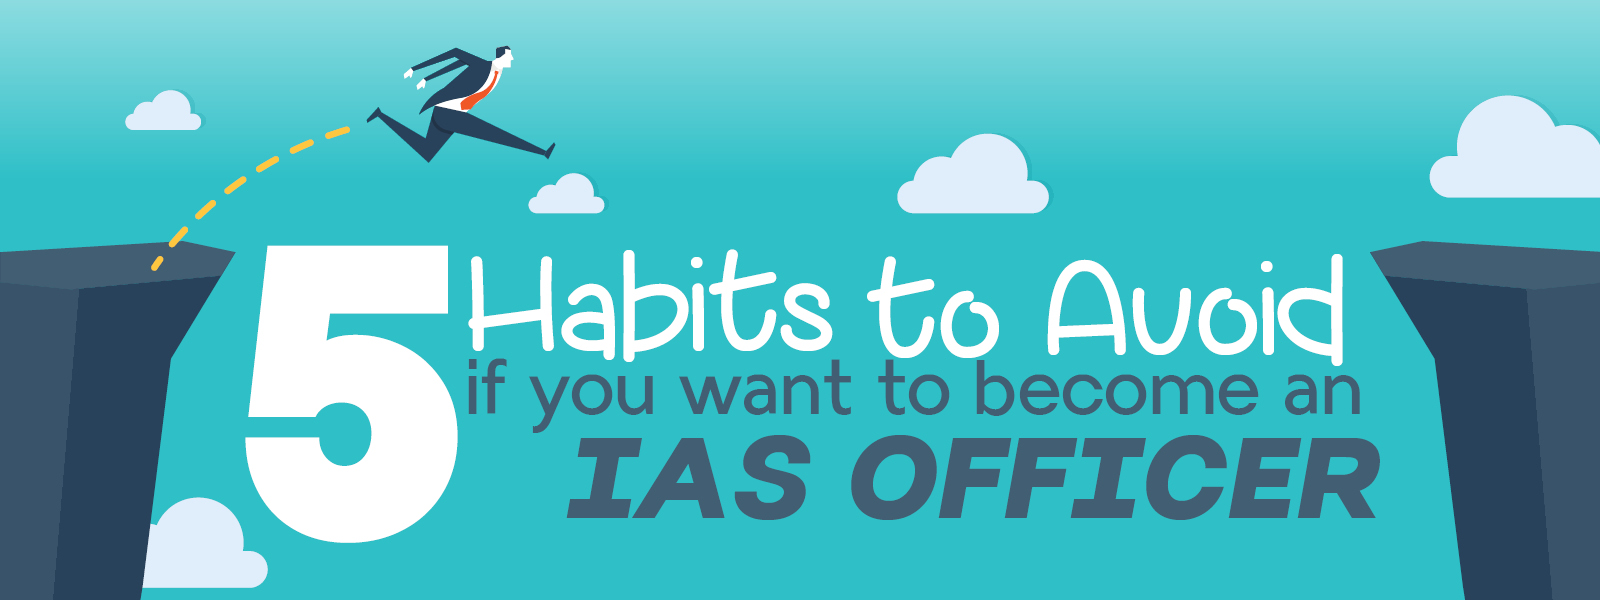 5 habits to avoid (1)